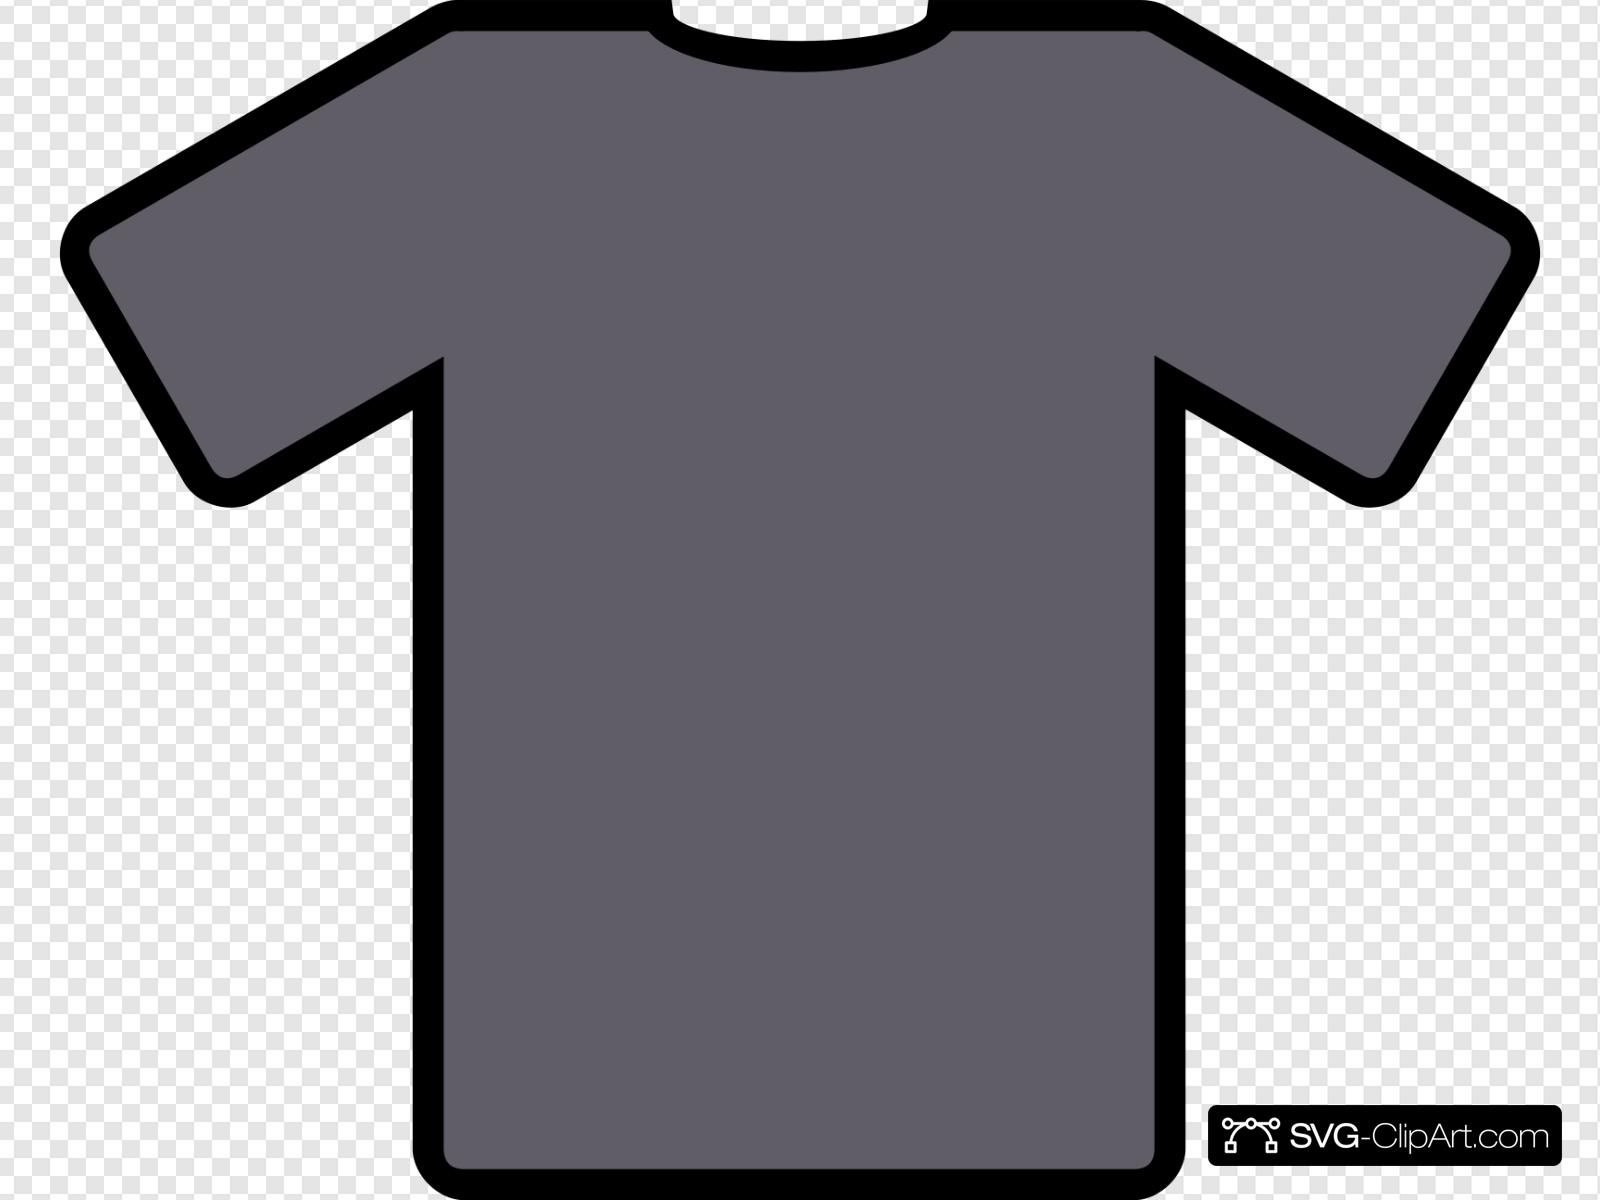 Ugt clipart png transparent Clothing T Shirt Clip art, Icon and SVG - SVG Clipart png transparent